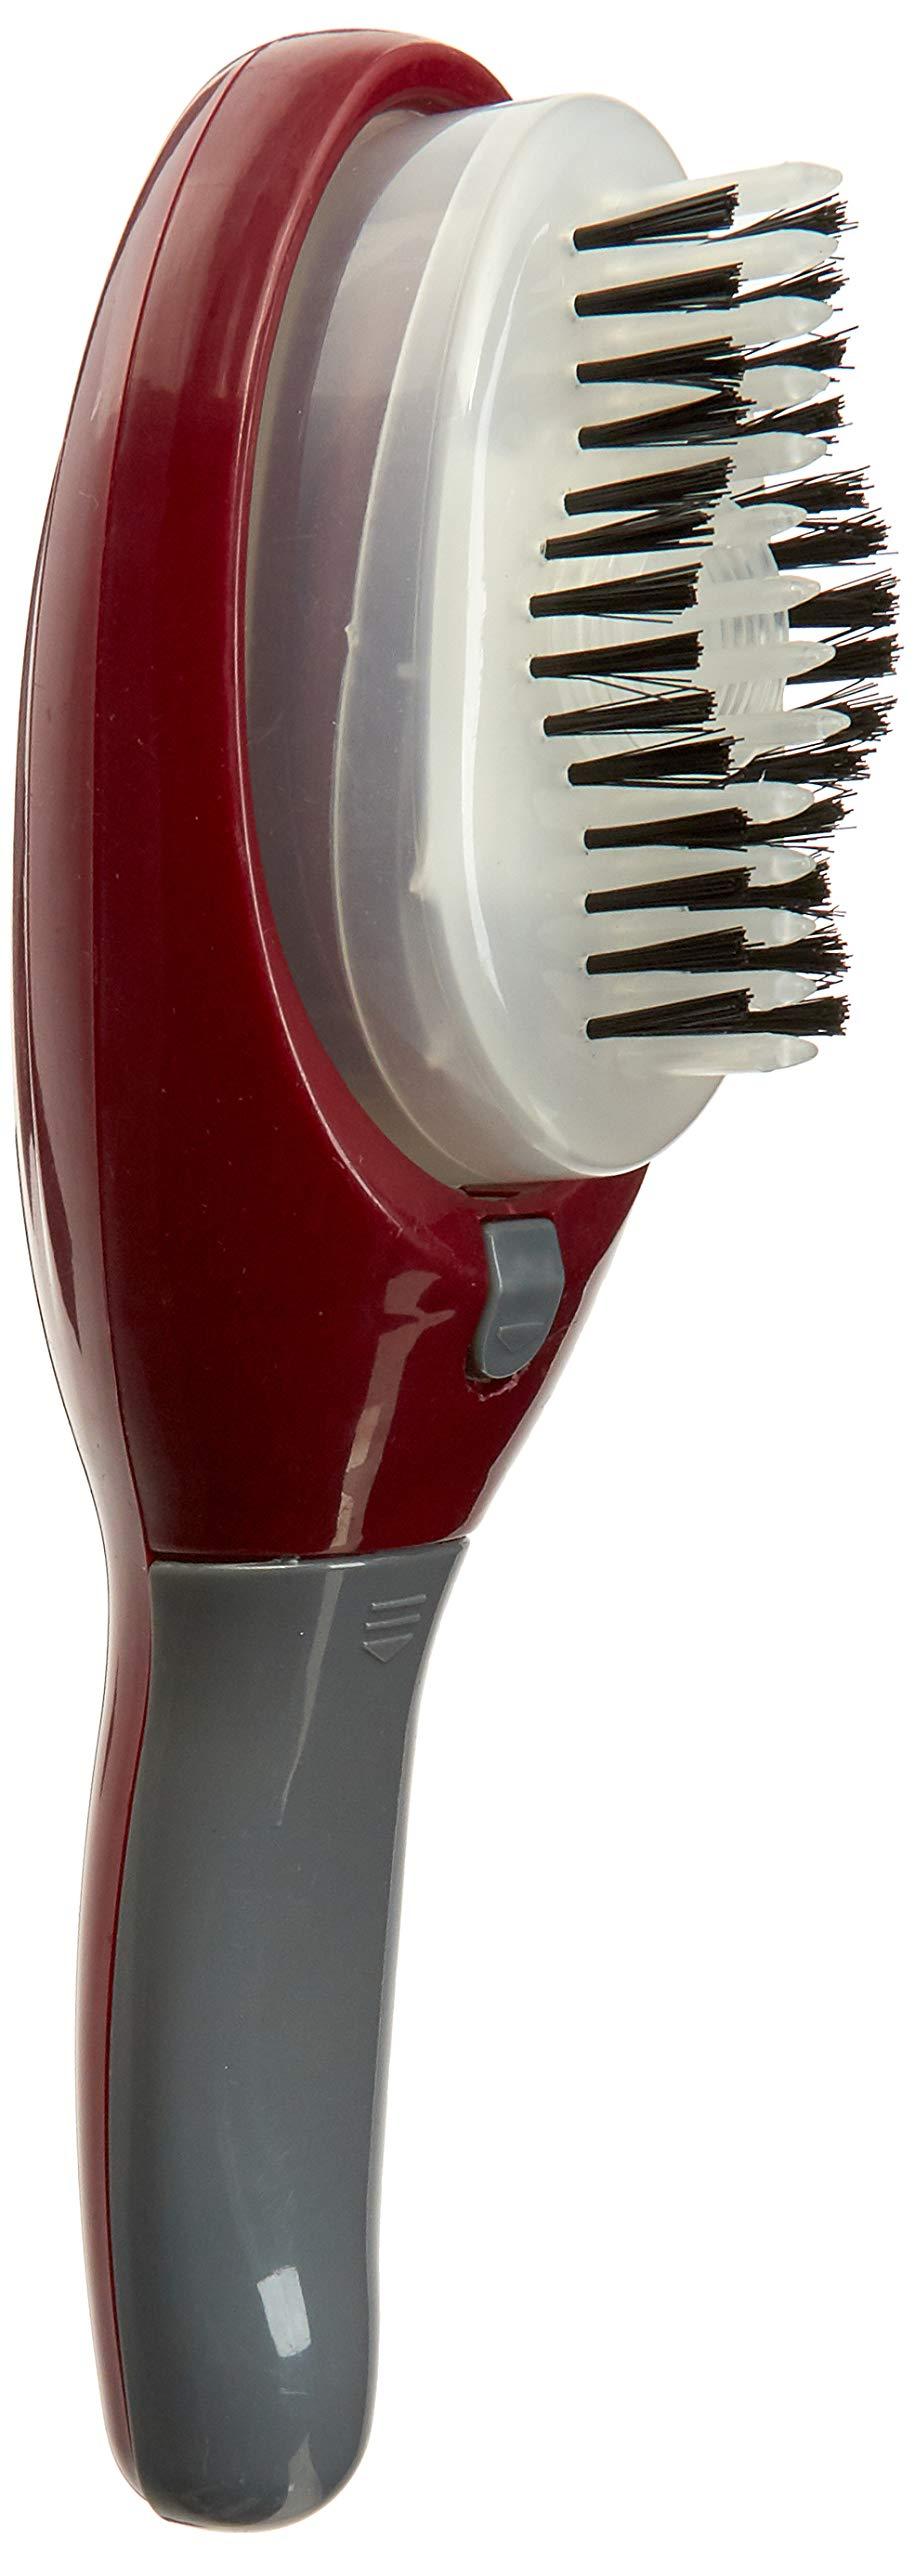 Bulk buys Salon Perfect Hair Coloring Brush by bulk buys